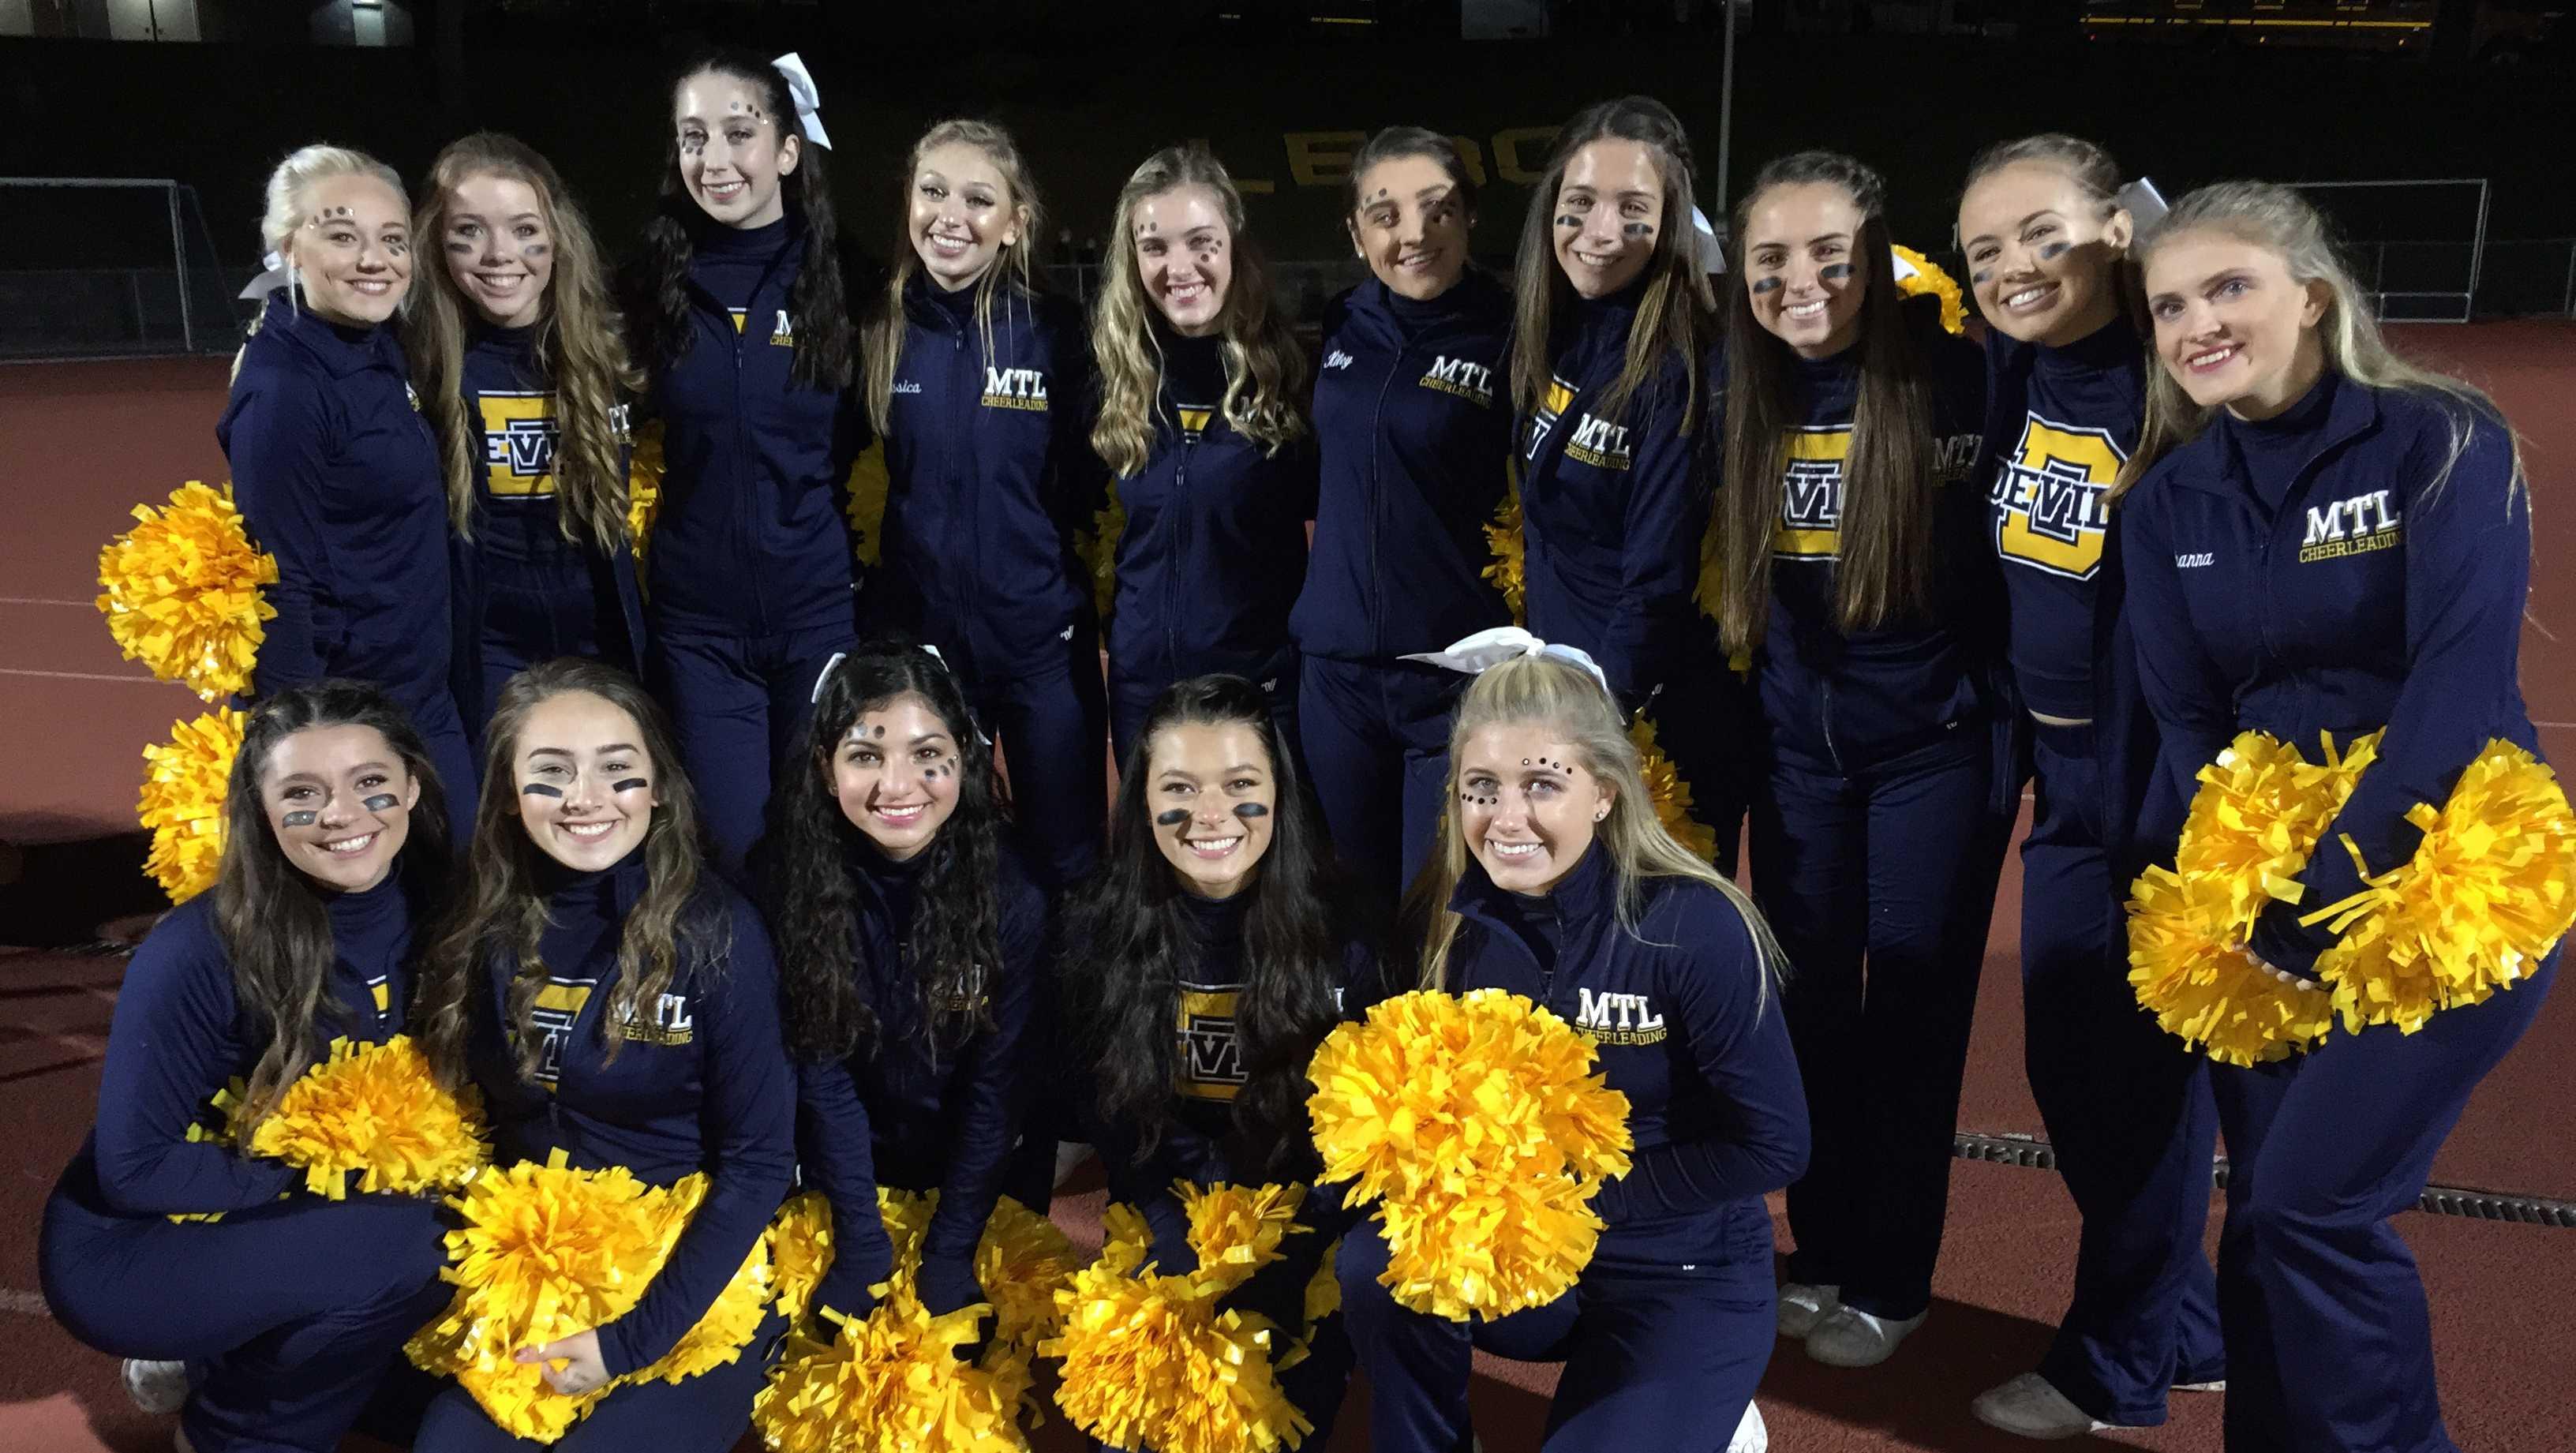 Mt. Lebanon cheerleaders